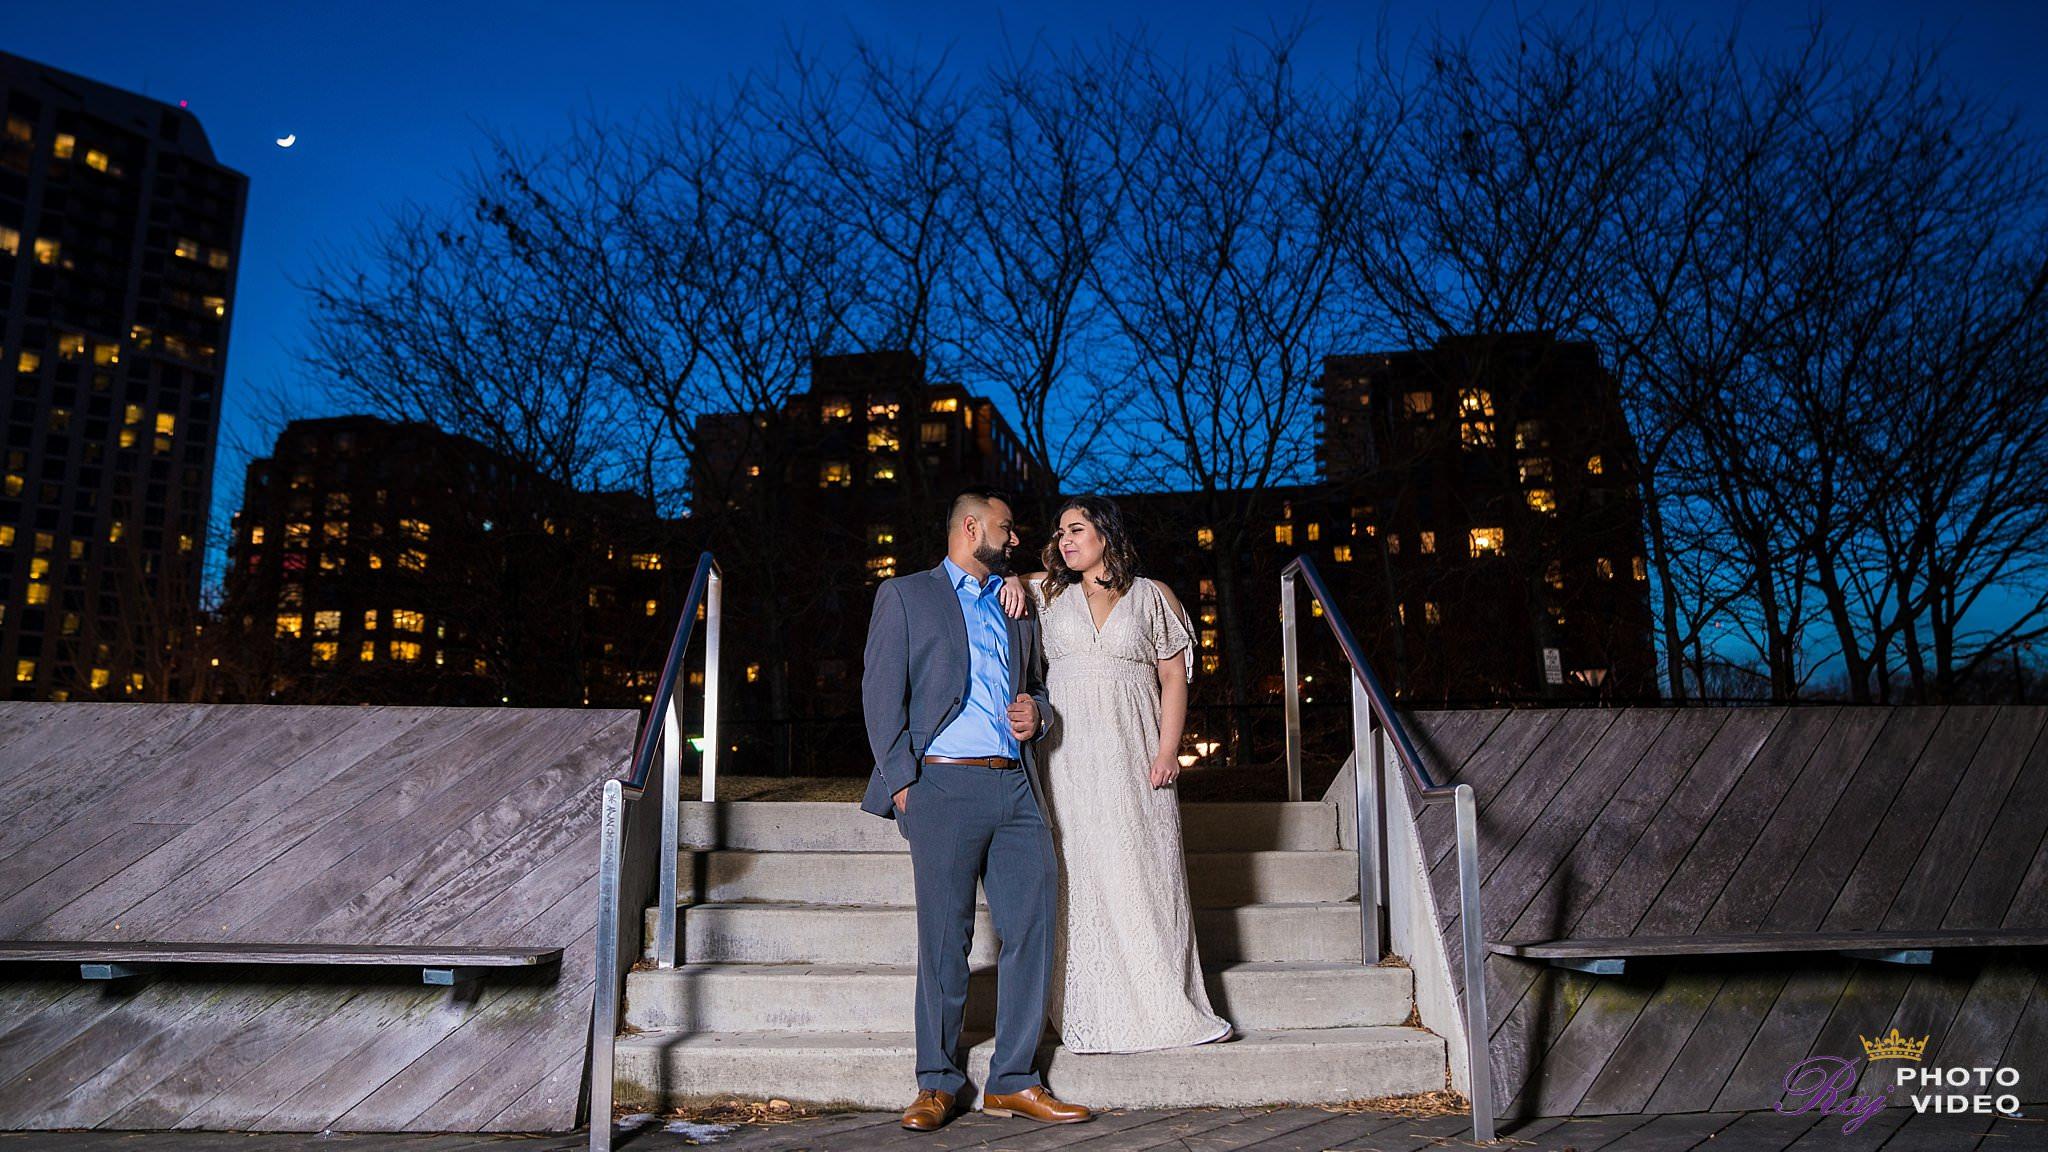 Hoboken-Pier-Engagement-Shoot-Zalak-Parag-00019_Raj_Photo_Video.jpg